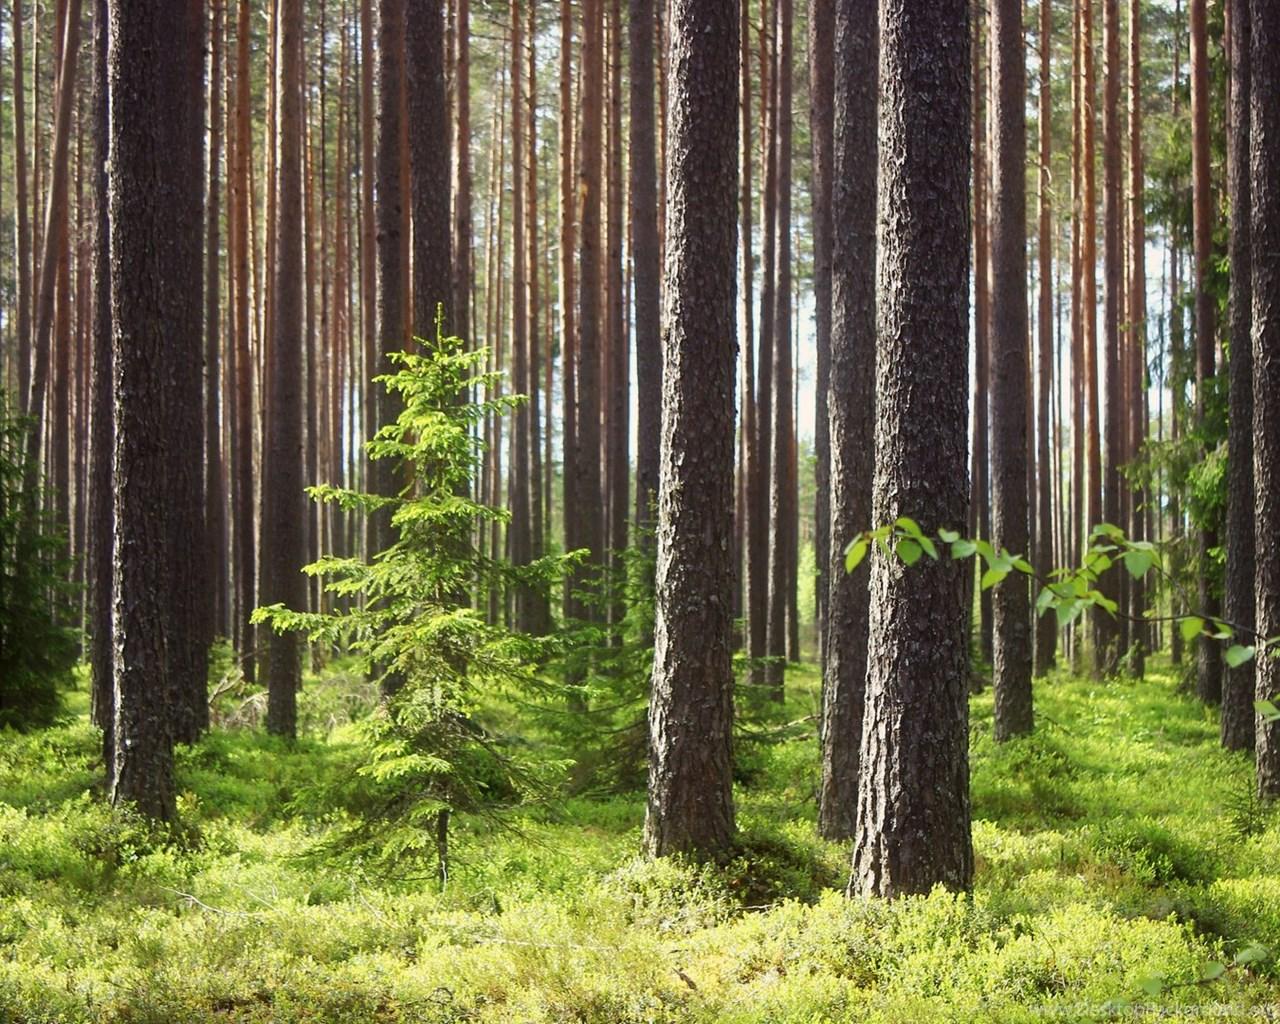 wallpapers green forrest forest 1920x1080 desktop background